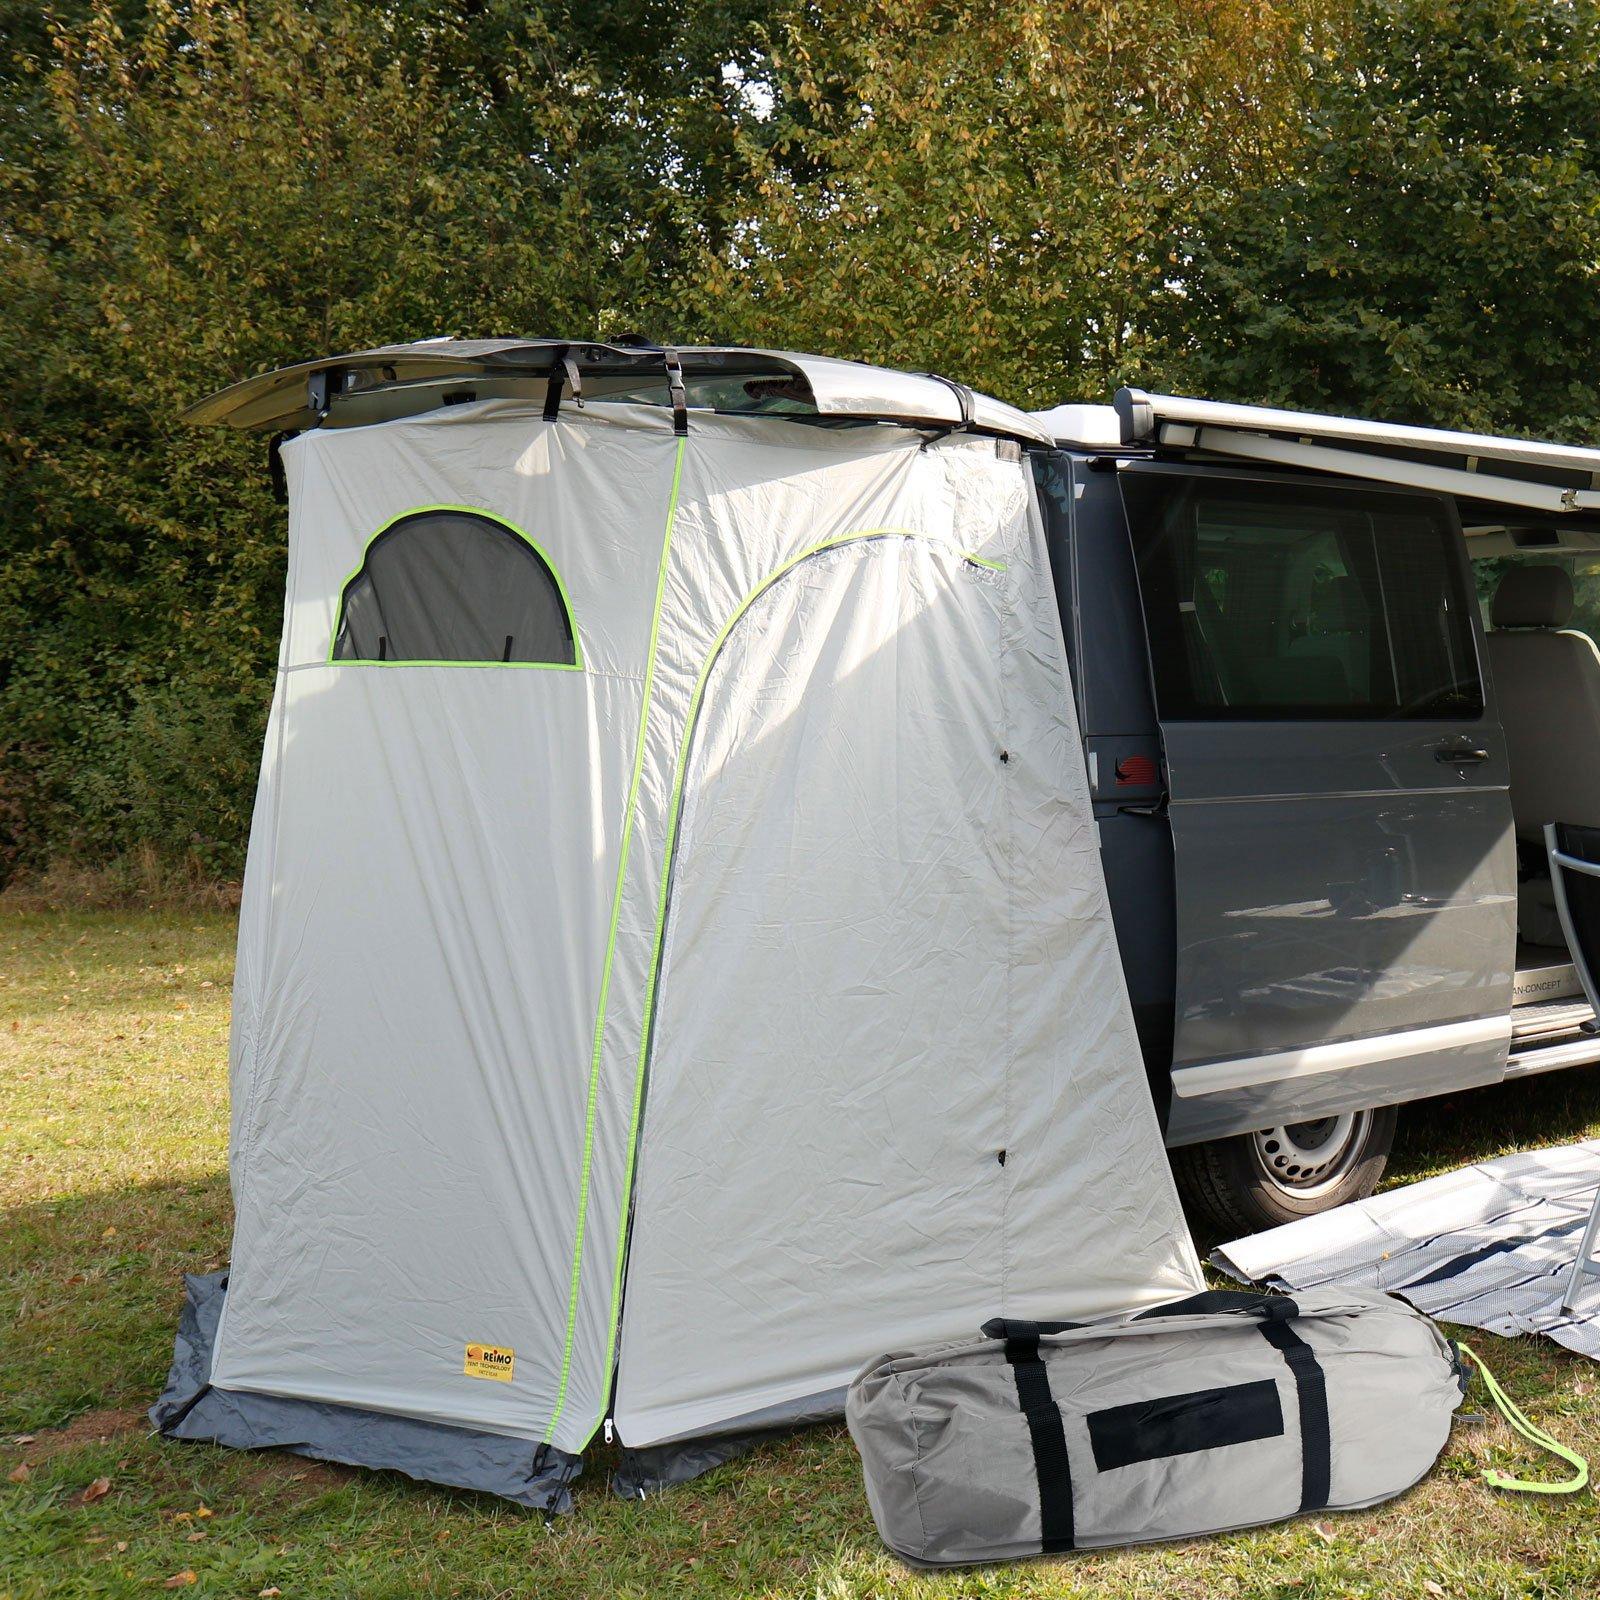 WESTFALIA Tenda Anteriore VW T2 Baywindow GIALLO COME ORIGINALE C9308Y